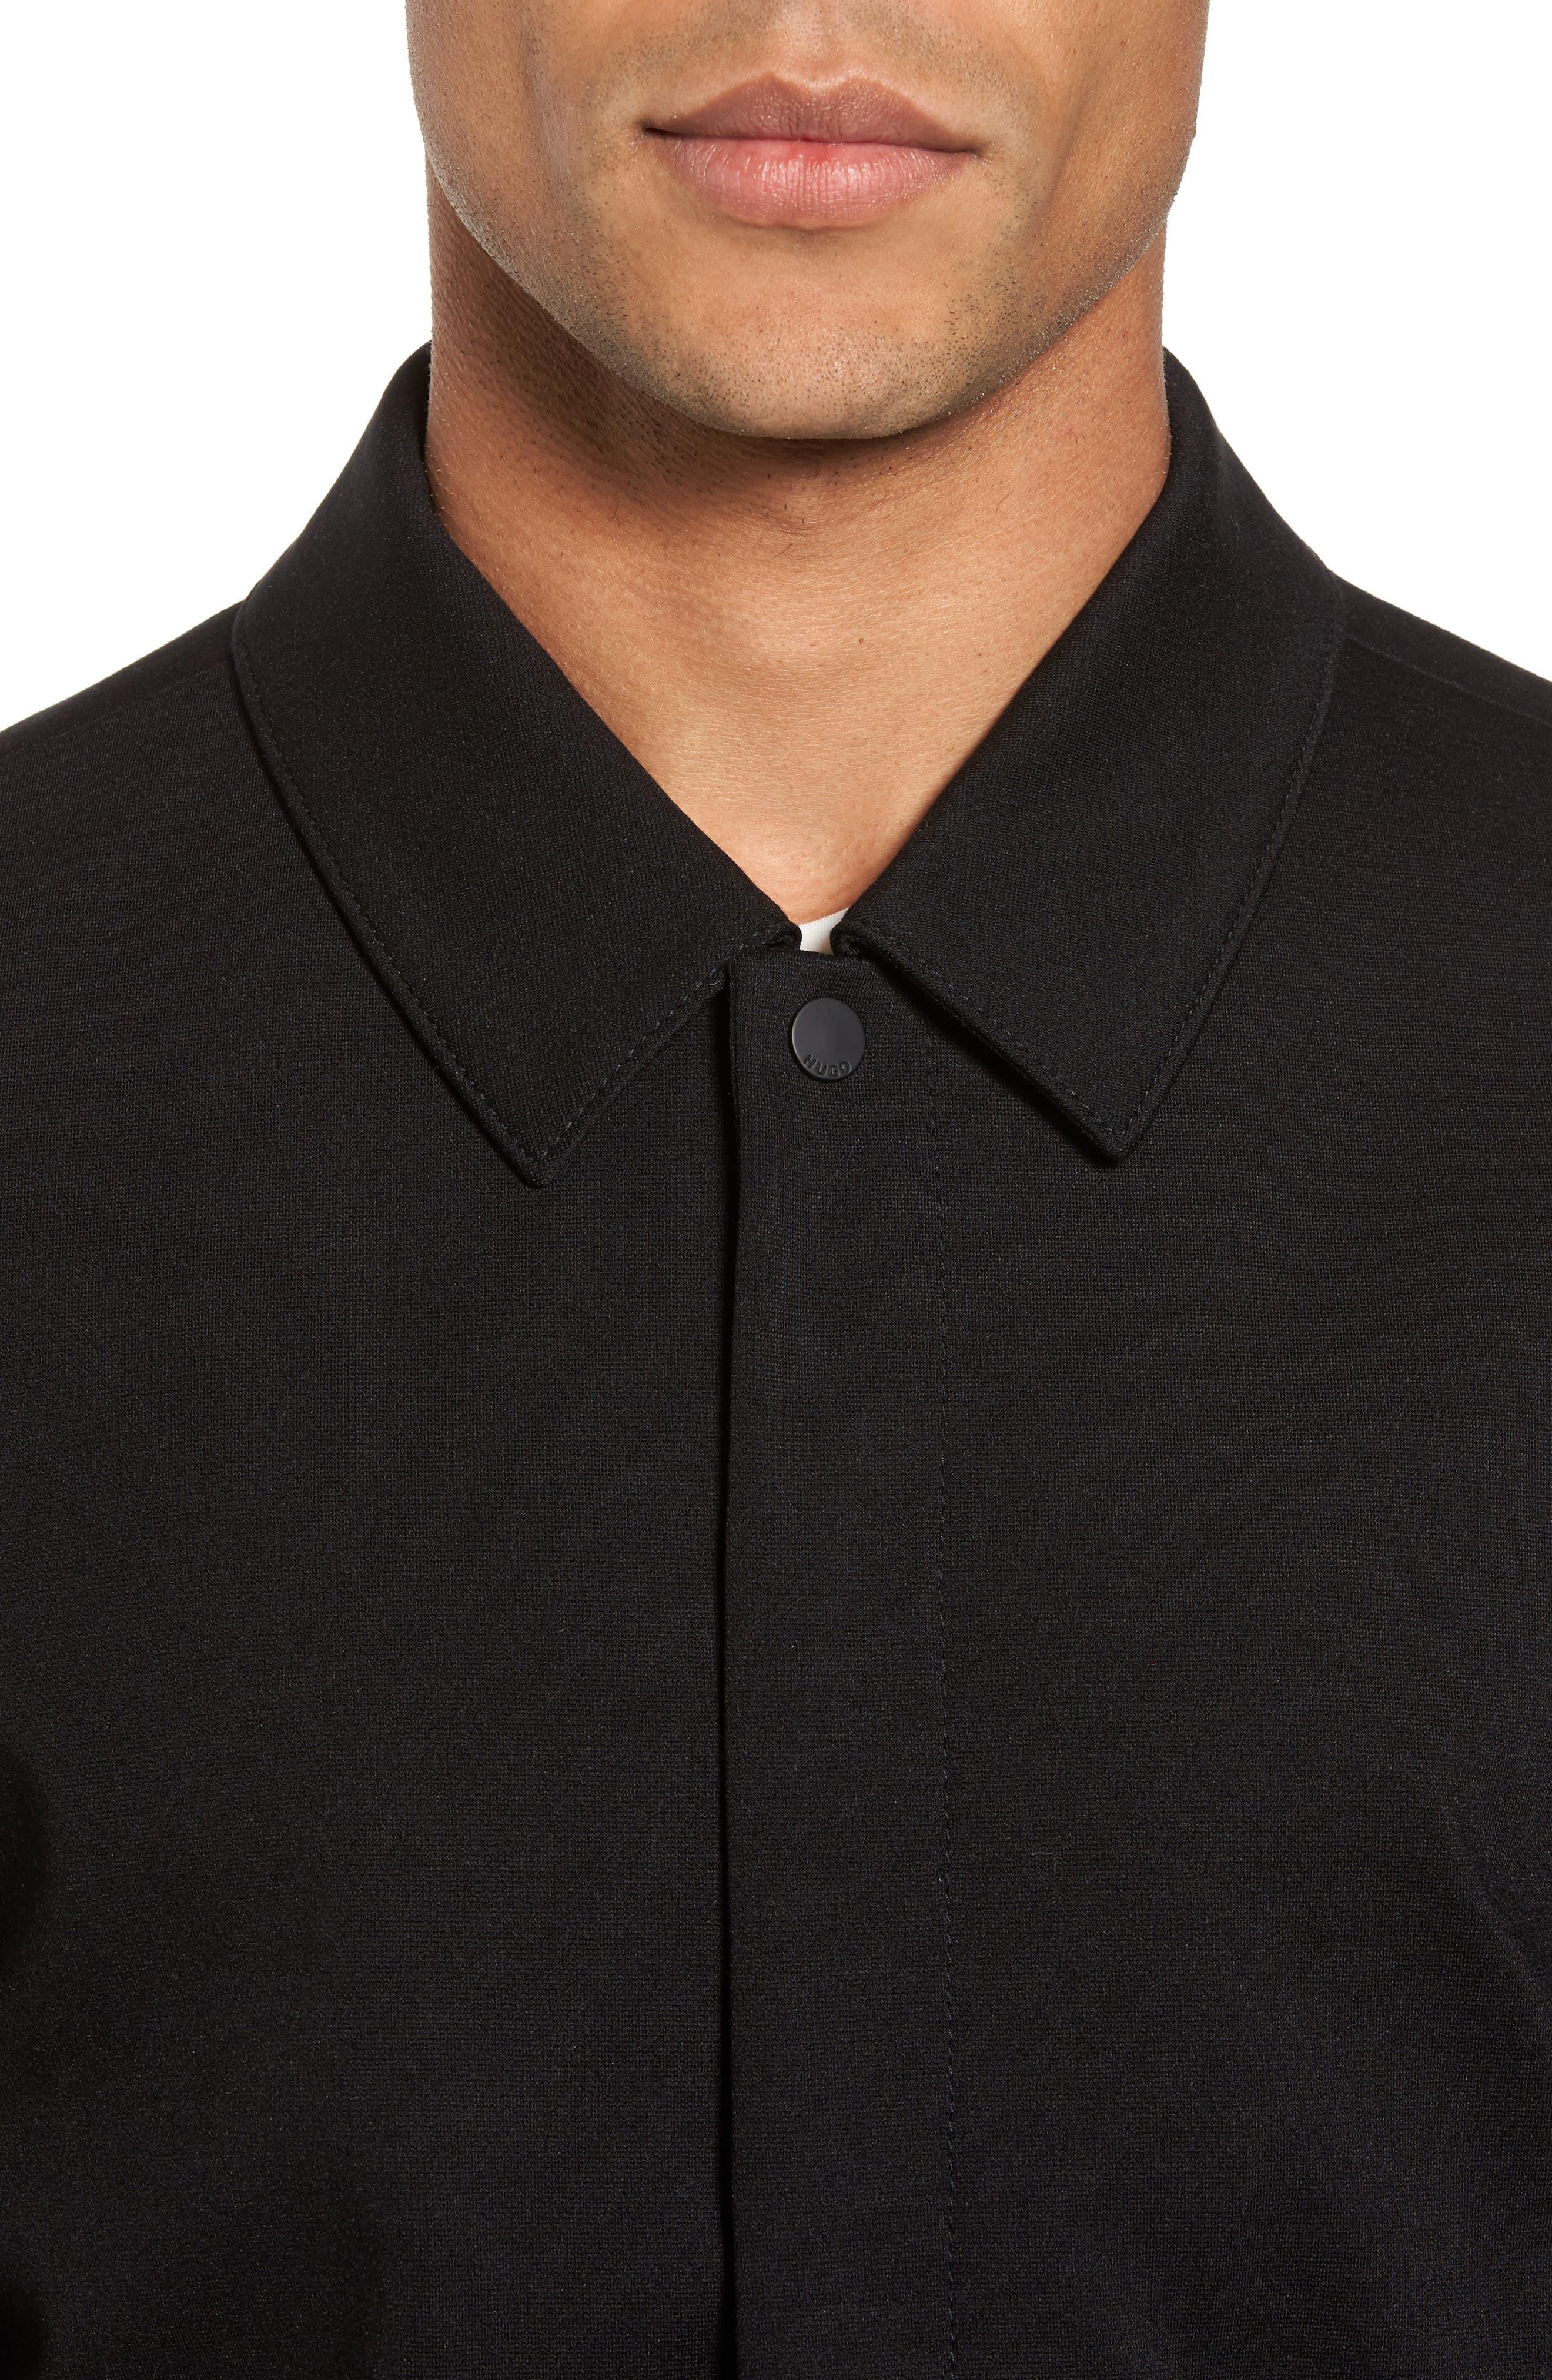 Hugo Boss Babenu Shirt Jacket,                             Alternate thumbnail 4, color,